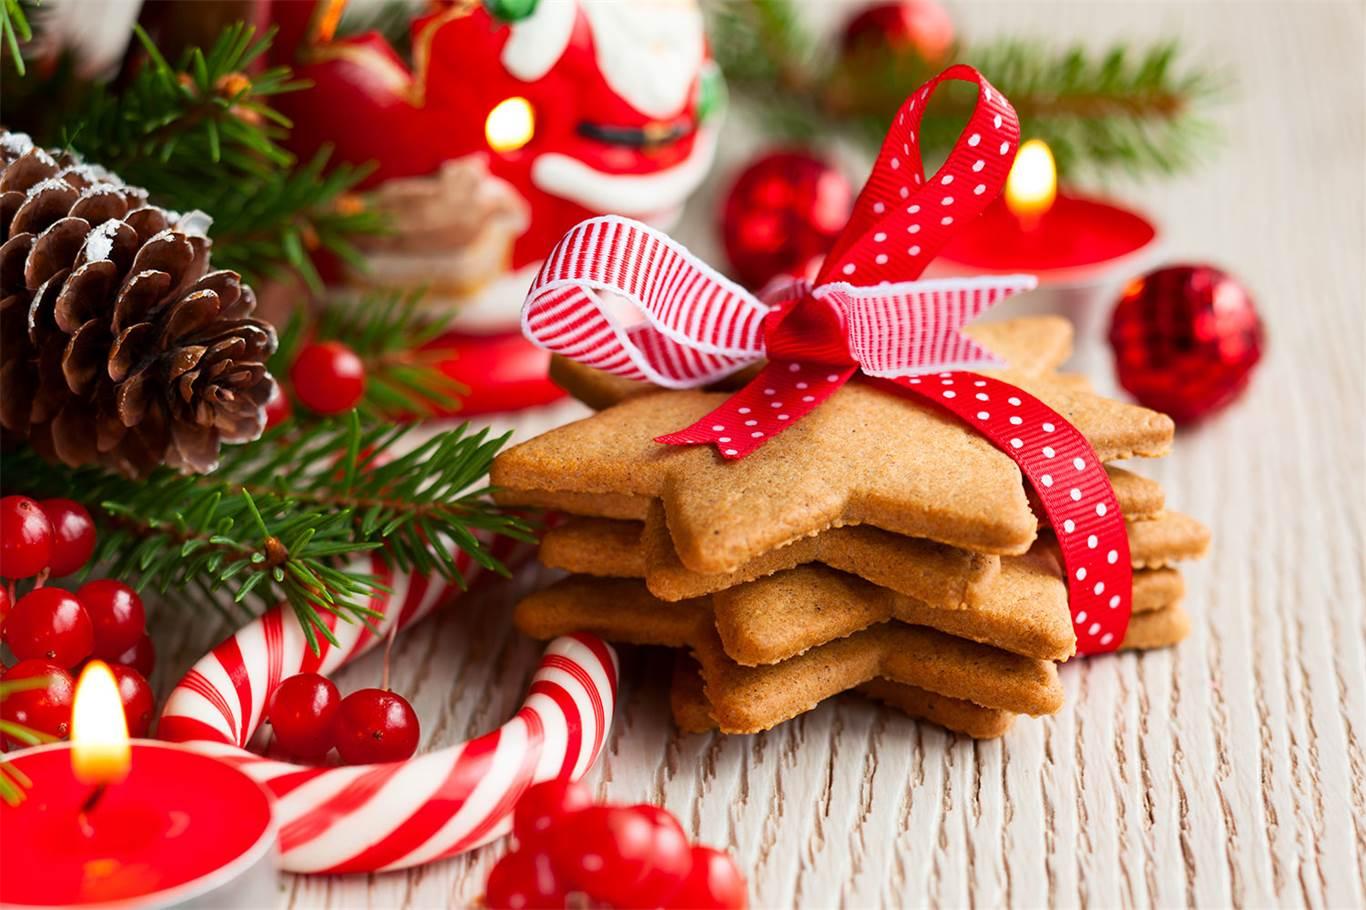 Christmas bazaar runs Saturday in Cannington